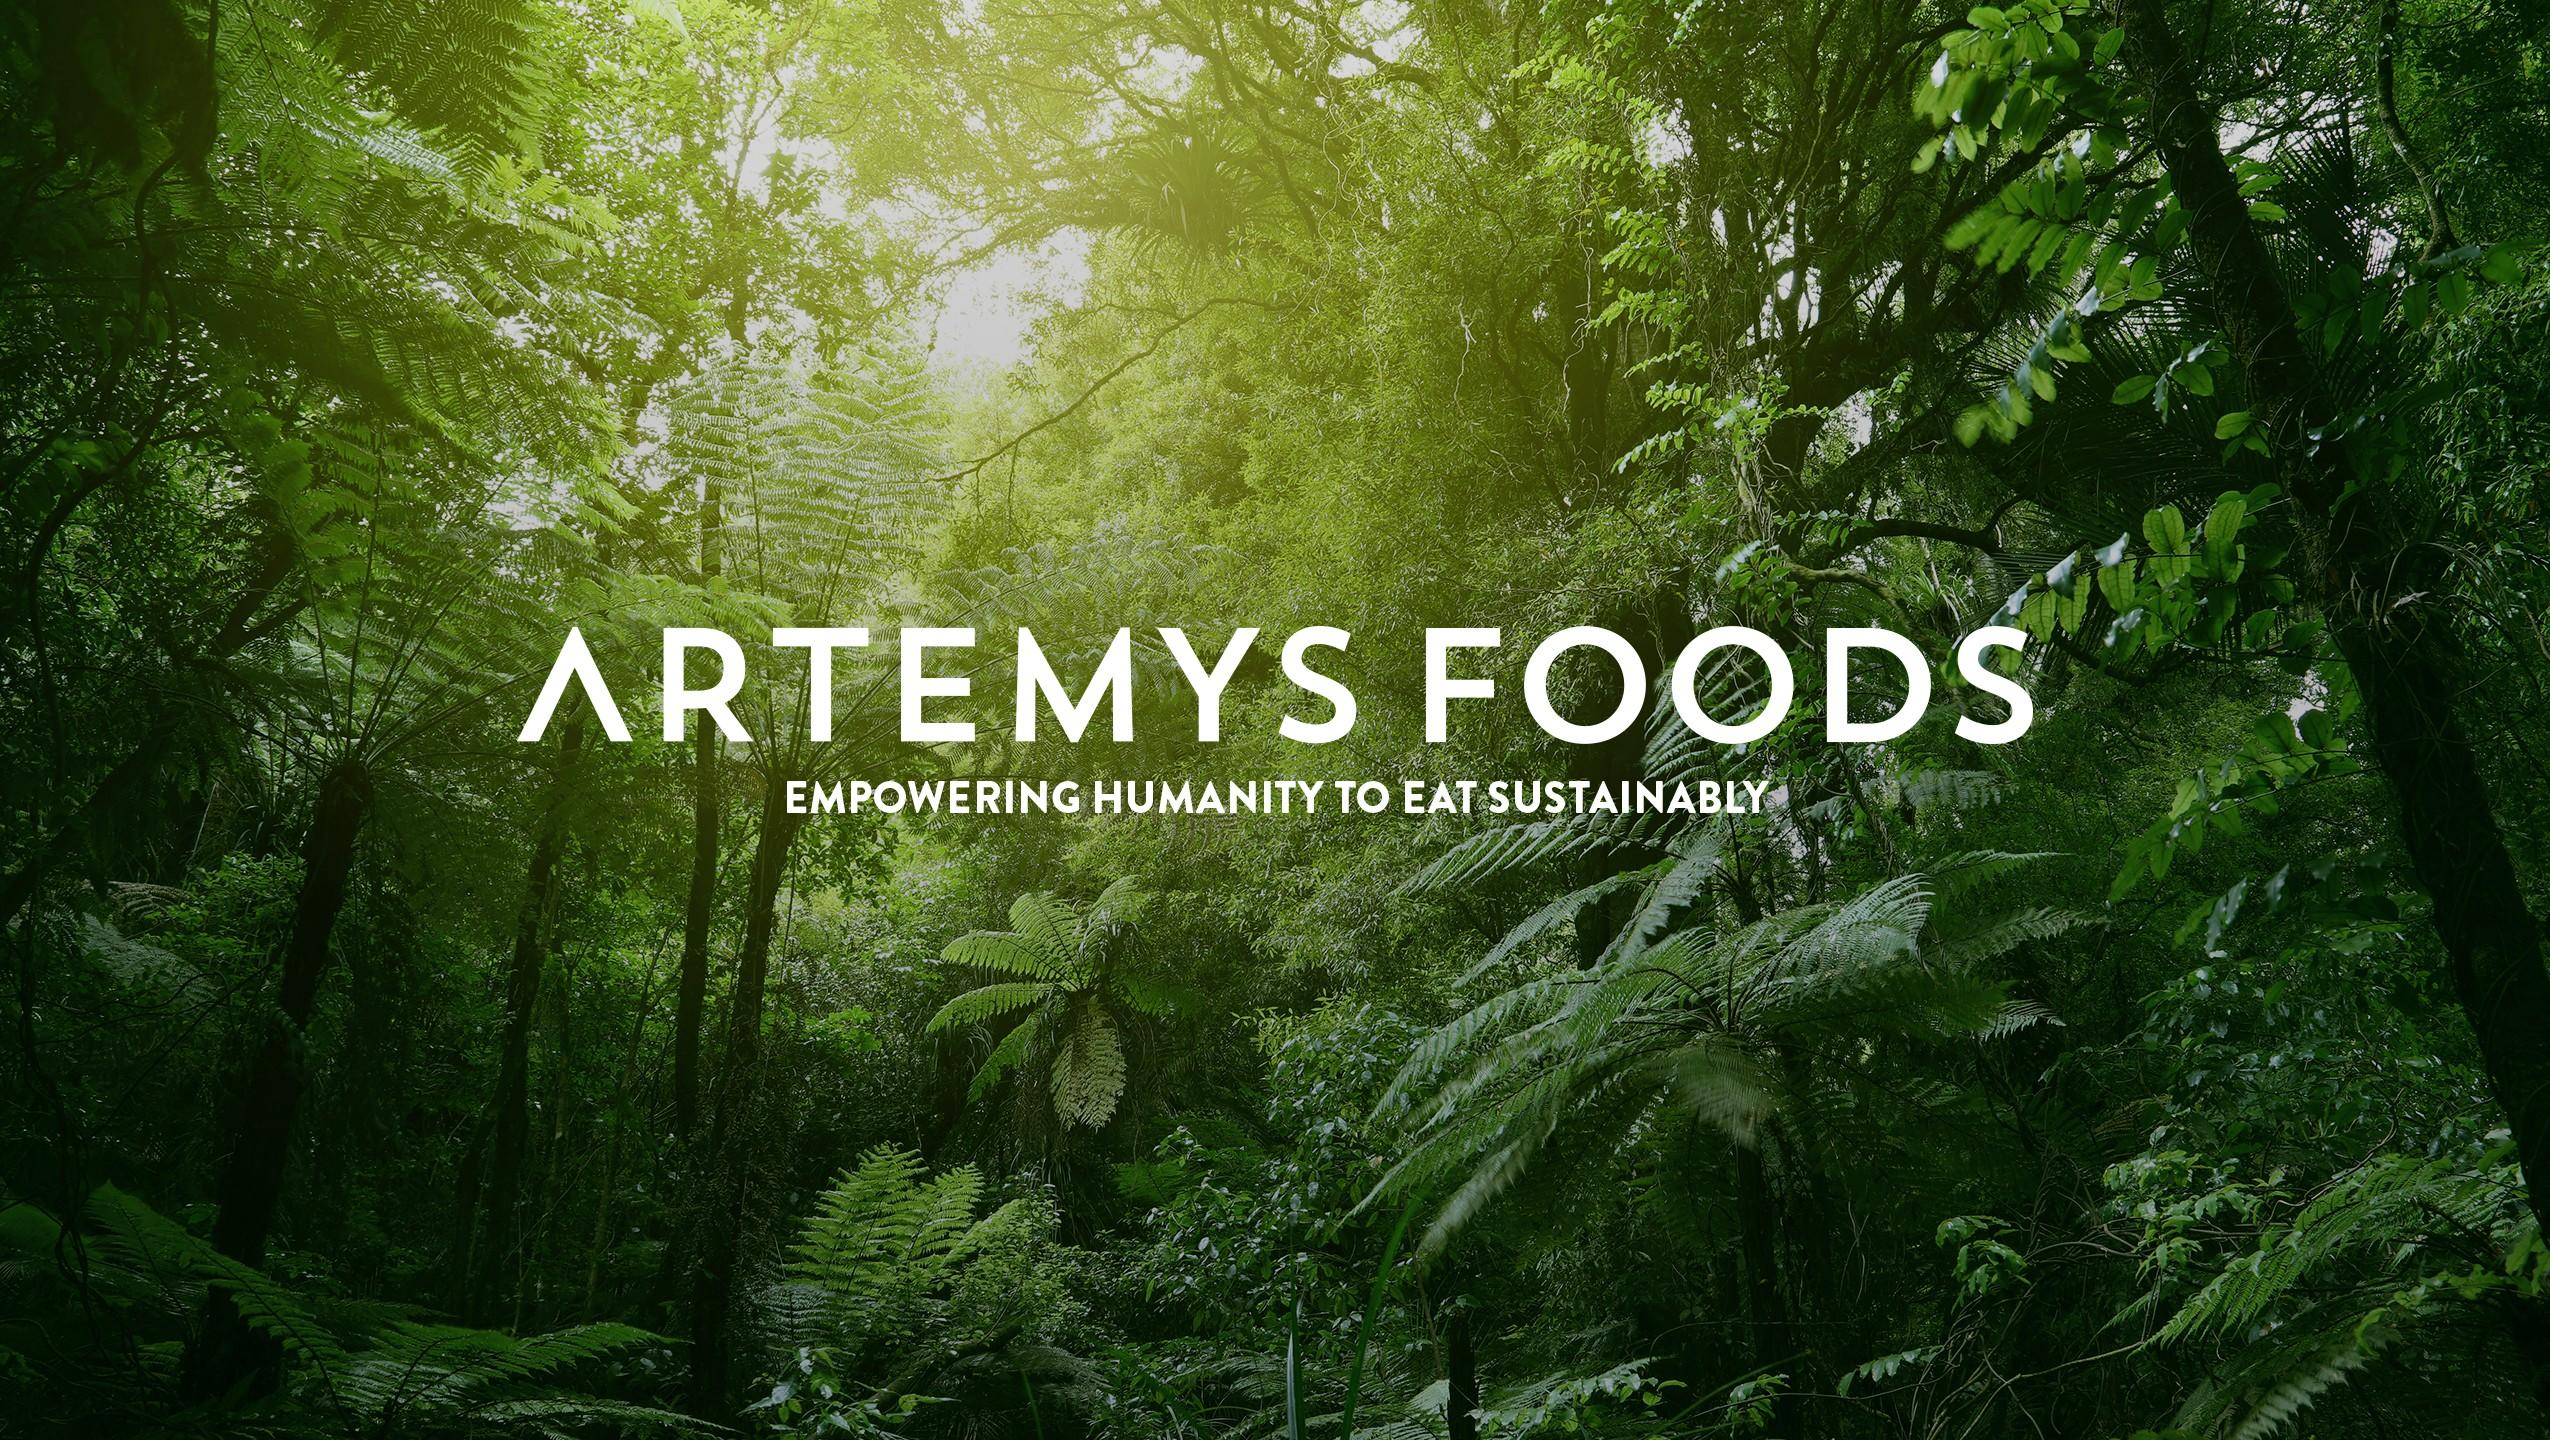 Green plants in rainforest